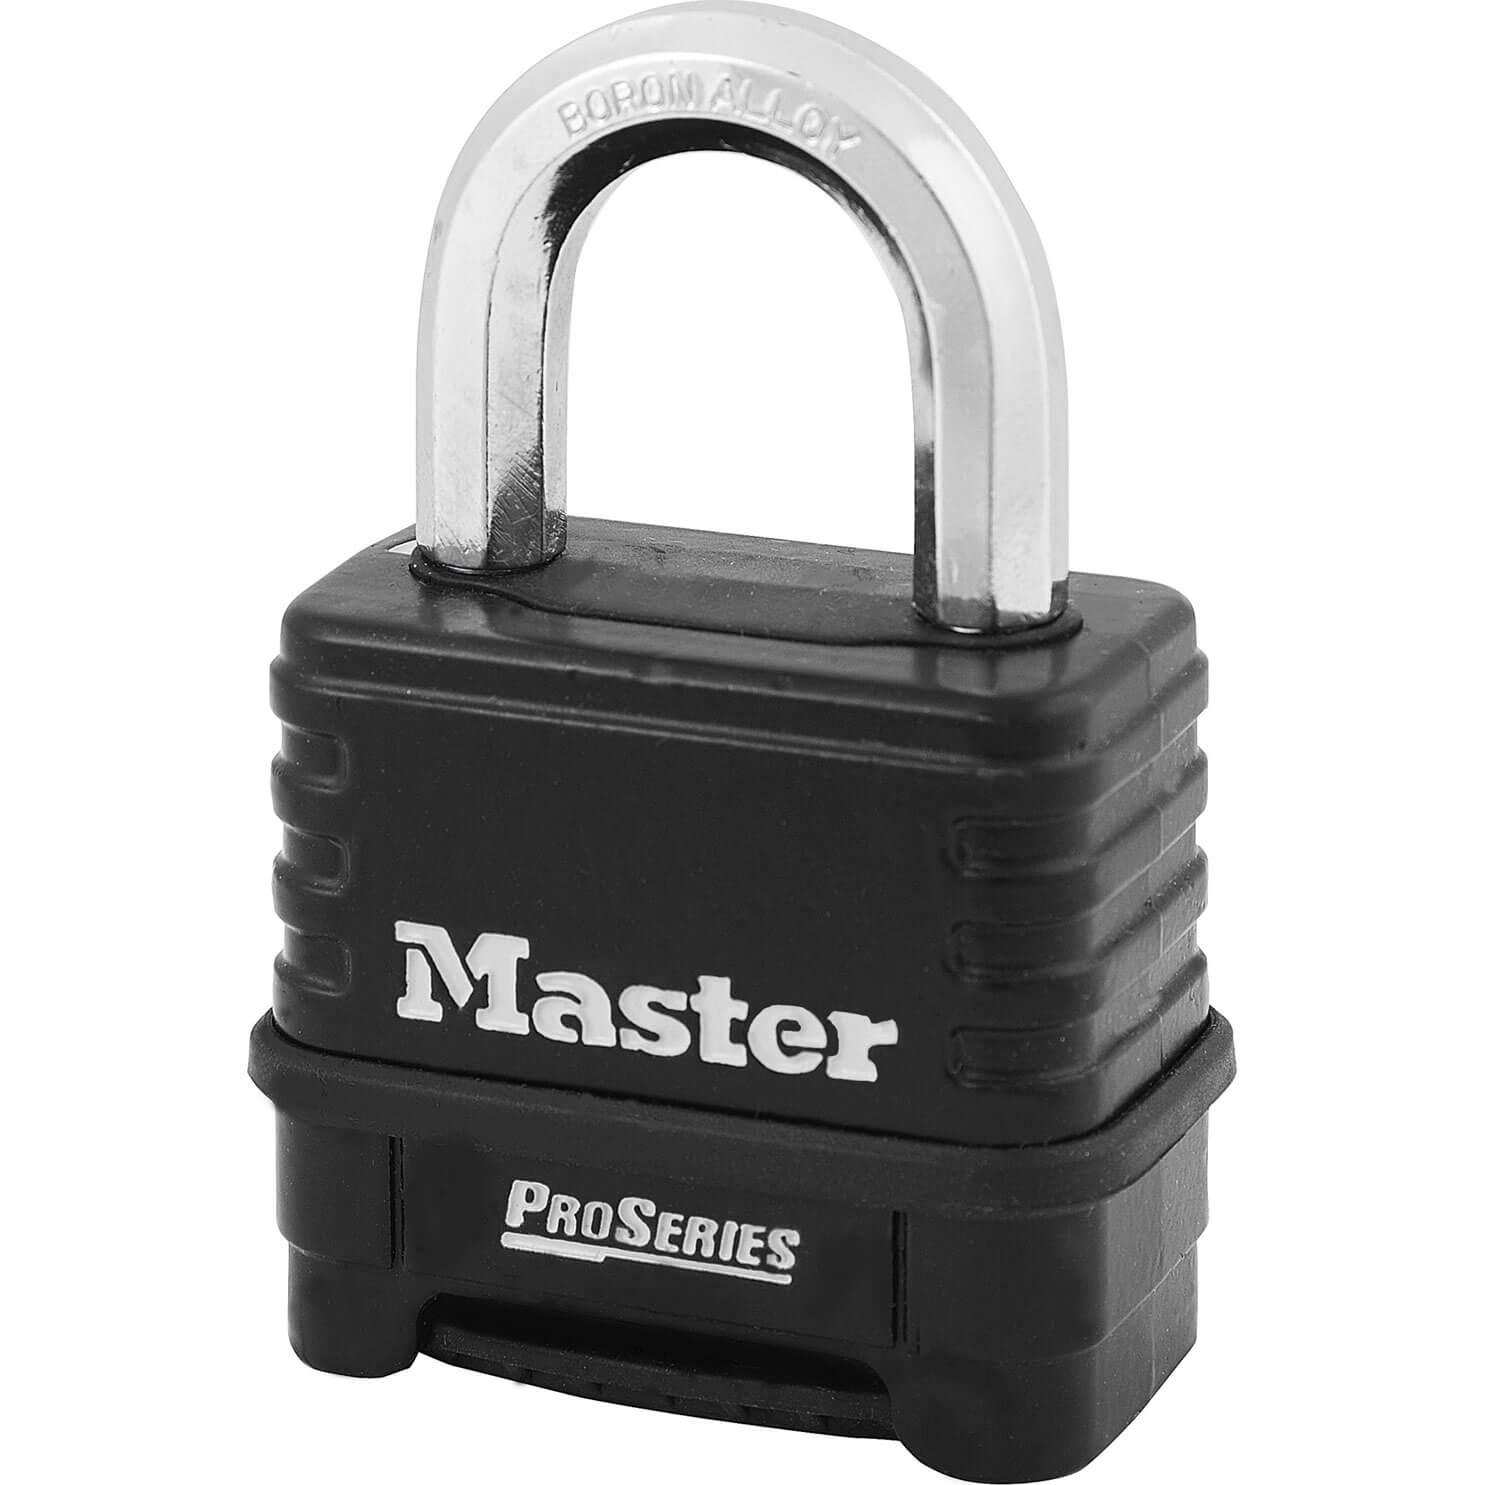 Masterlock Pro Series Die Cast Zinc Body Combination Padlock 57mm Standard